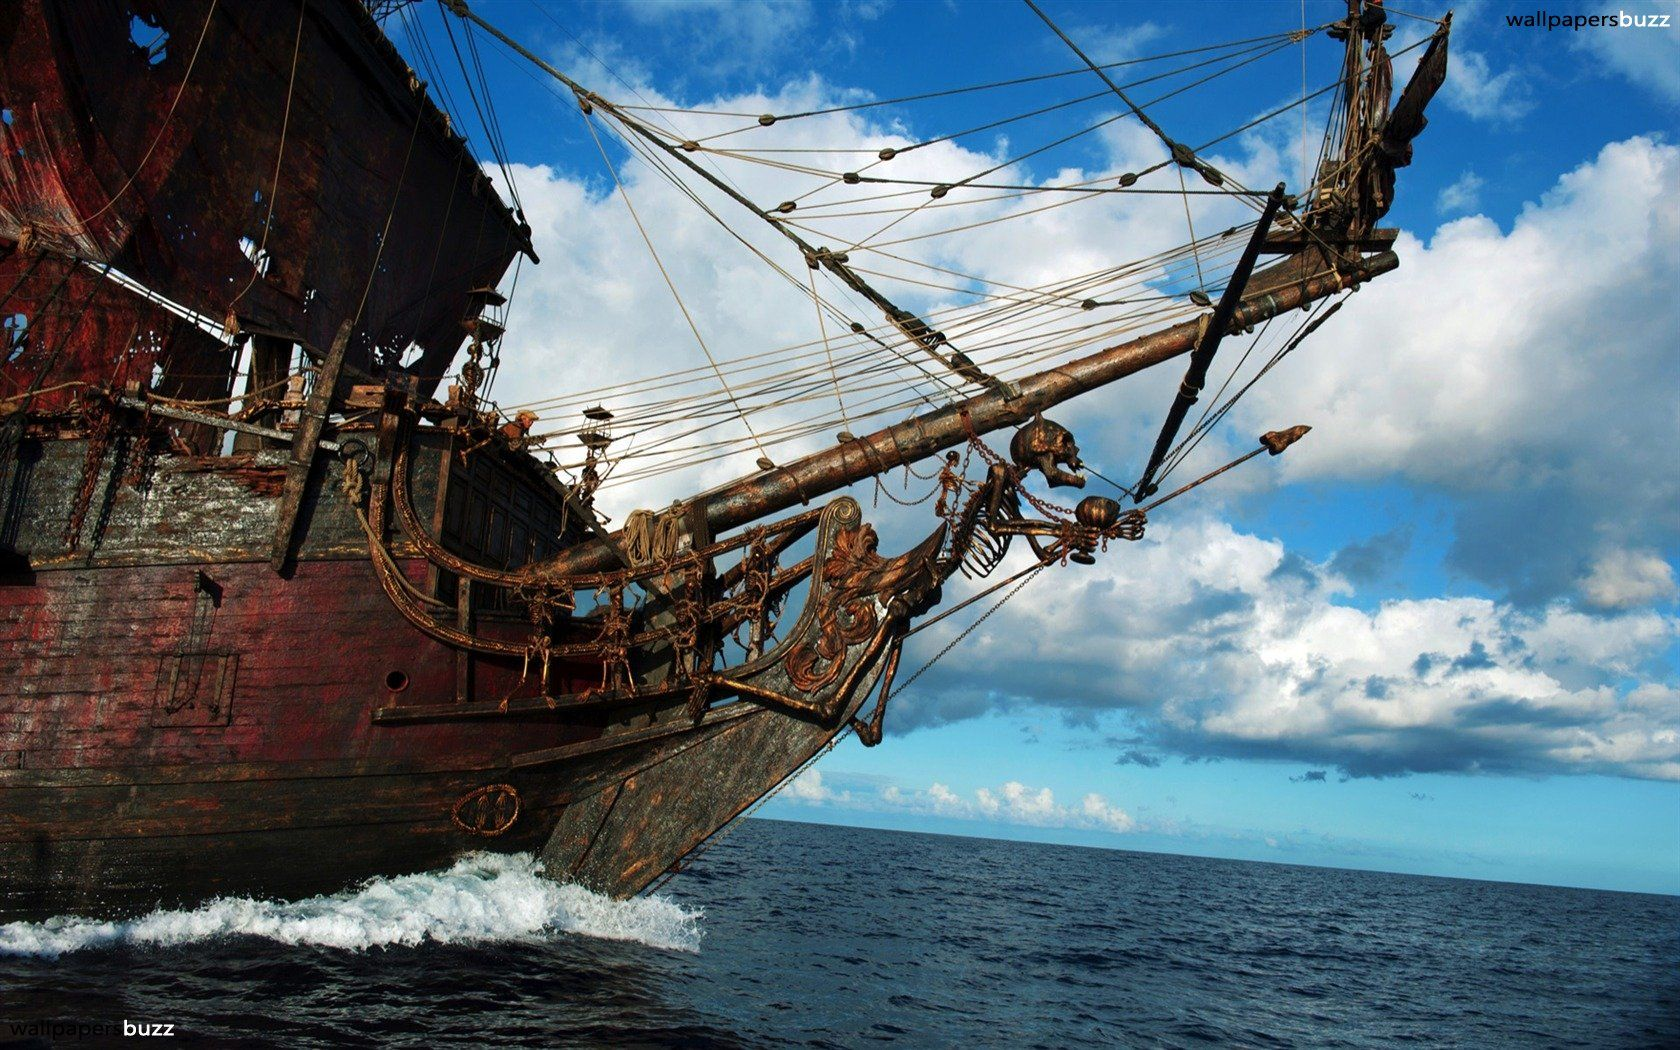 Fantasy ship cliff jolly roger pirate ship rock lightning wallpaper - Pirate Ship Pirate Ship Hd Wallpaper